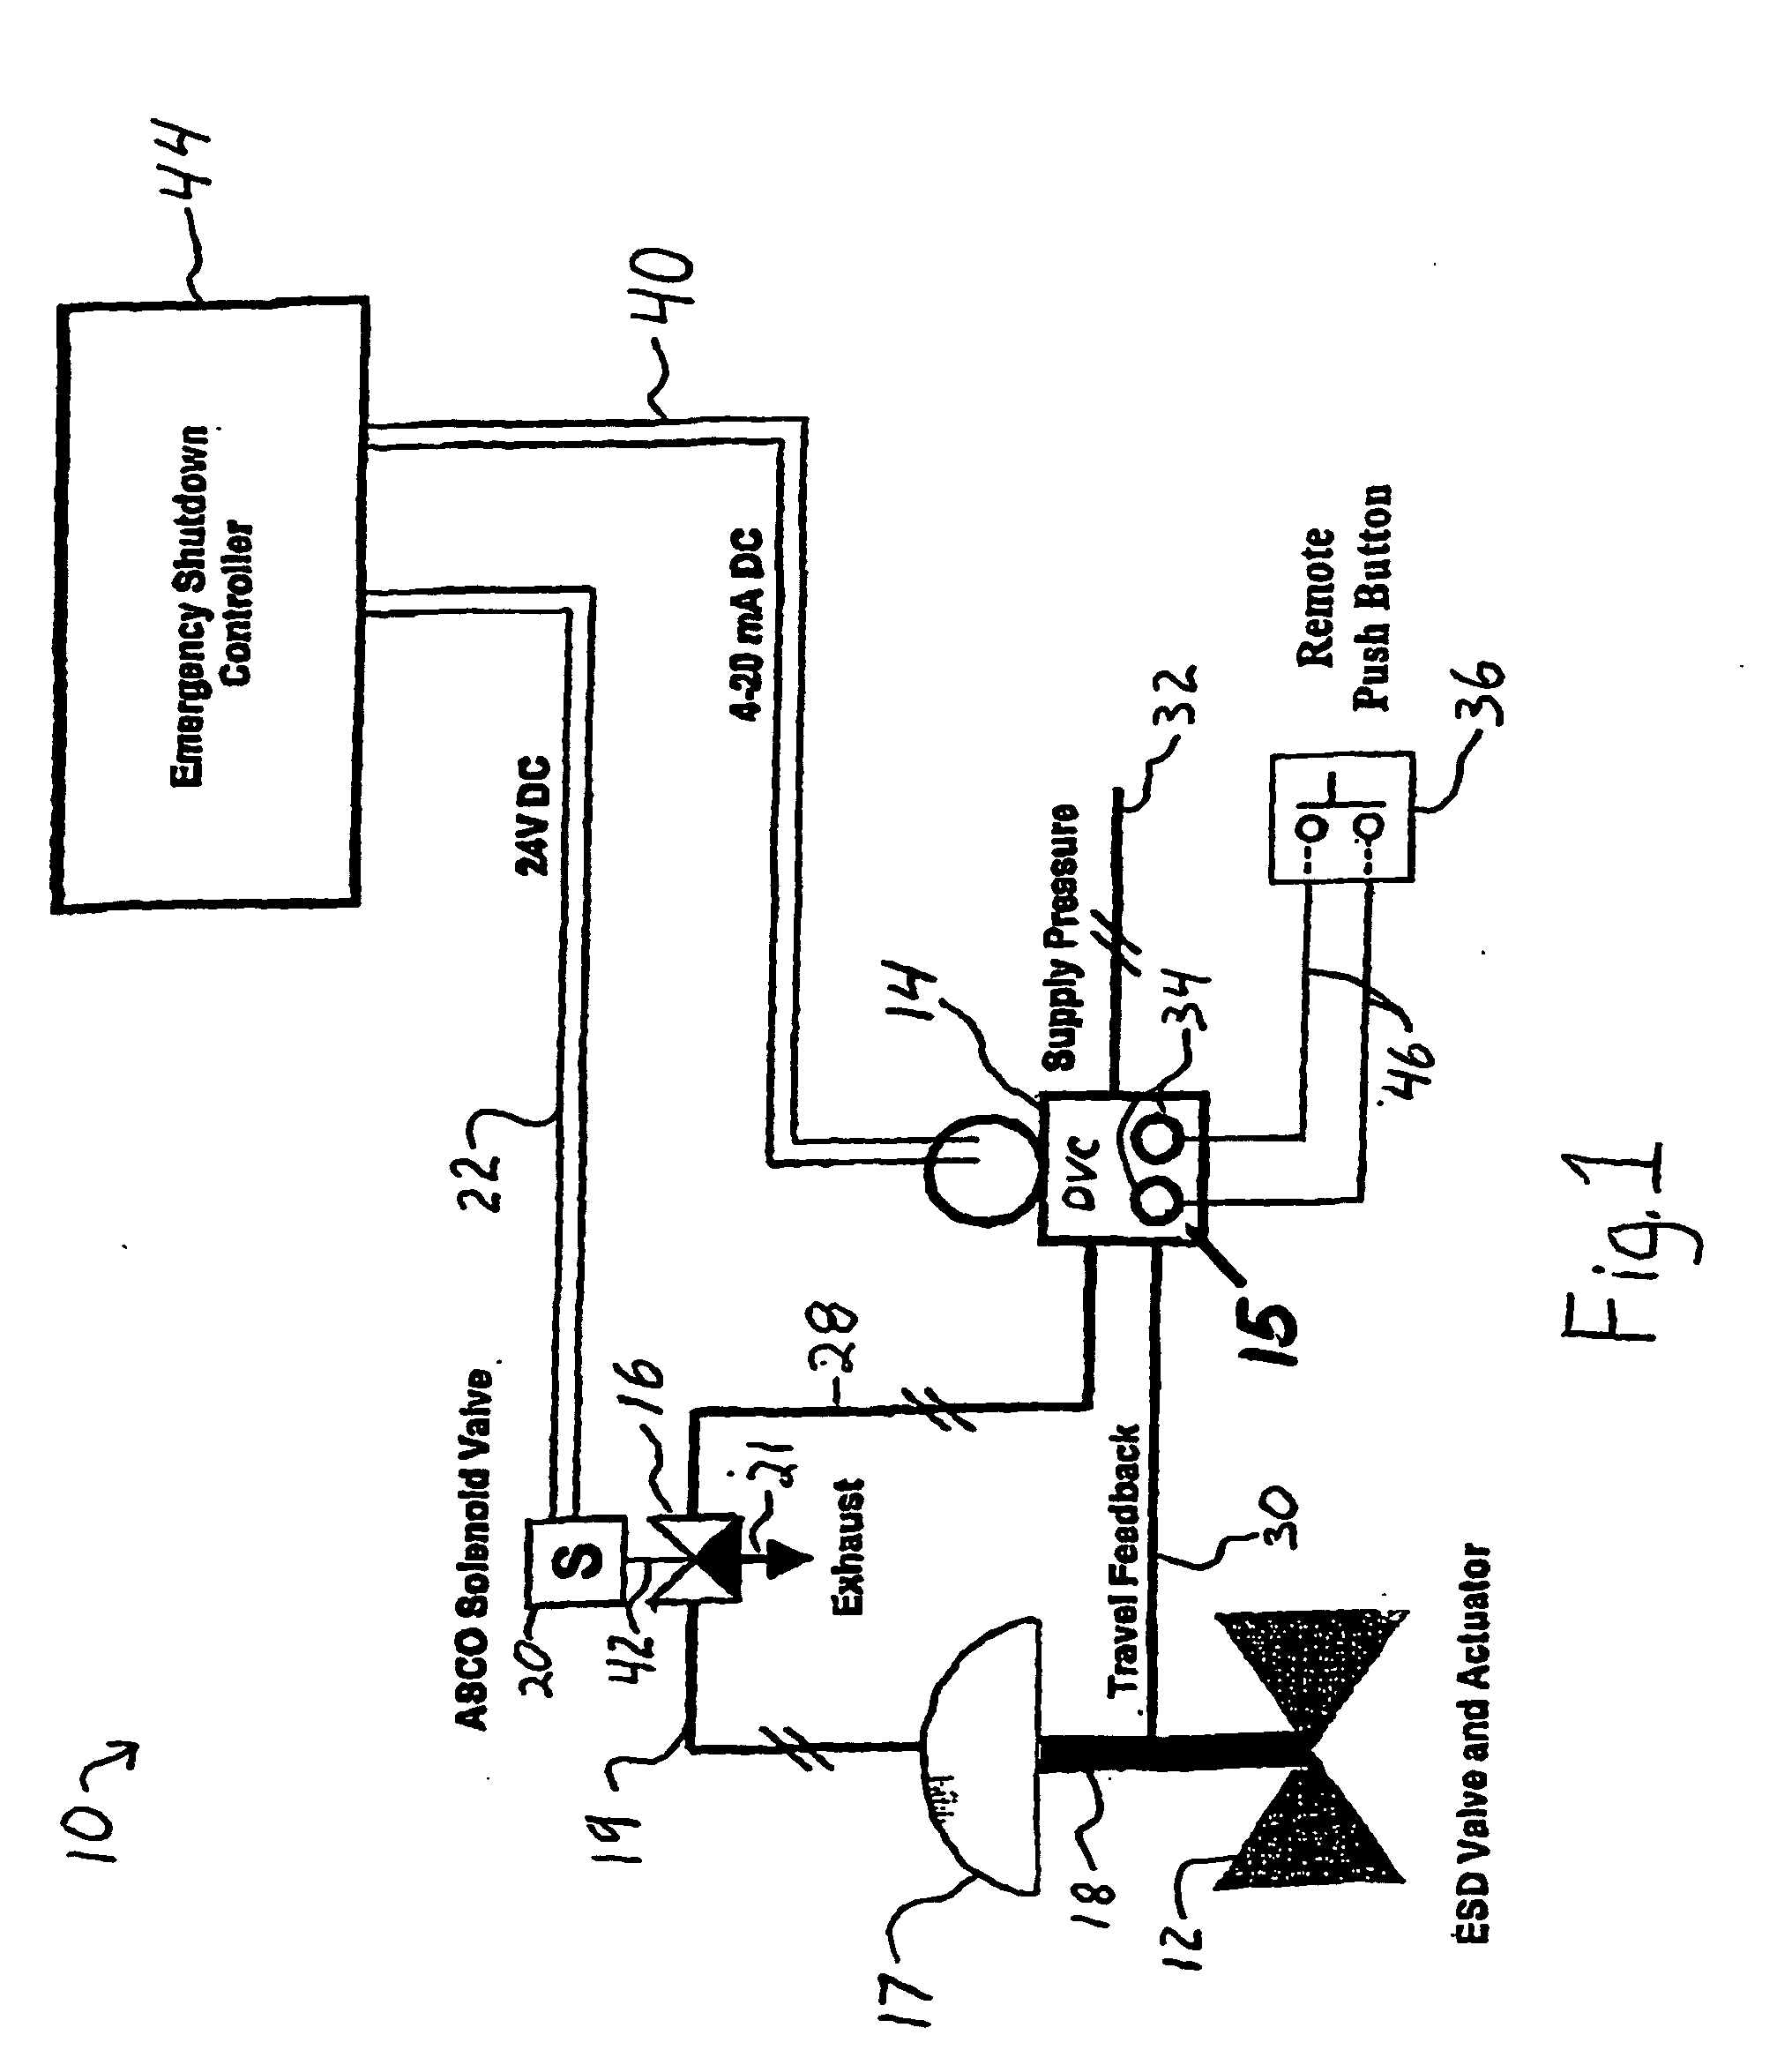 Kohler 22 Hp Ch22s Wiring Diagram Kohler Charging Wiring